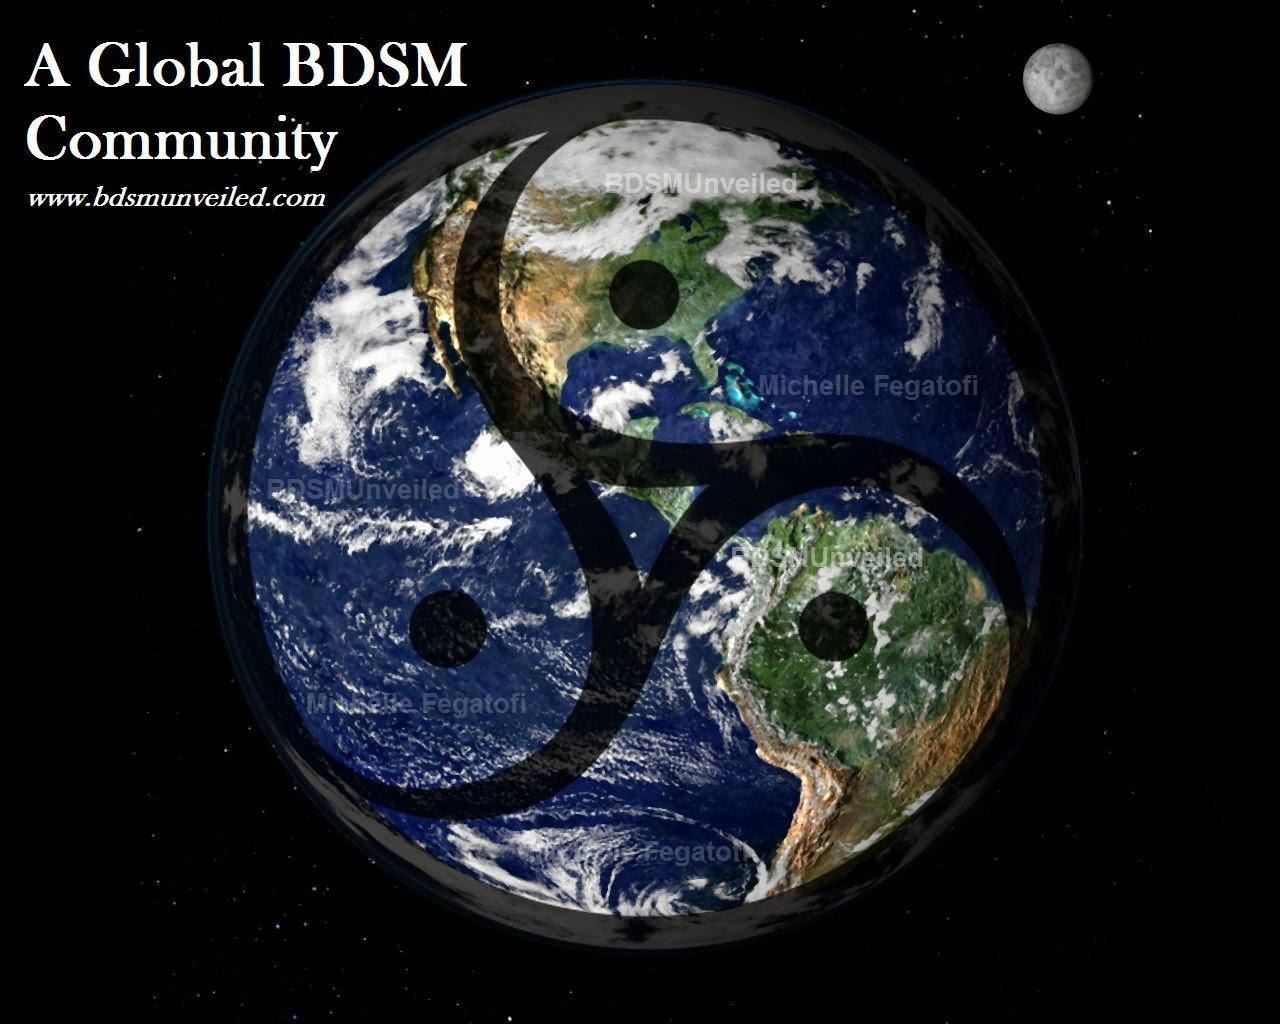 A Global BDSM Community